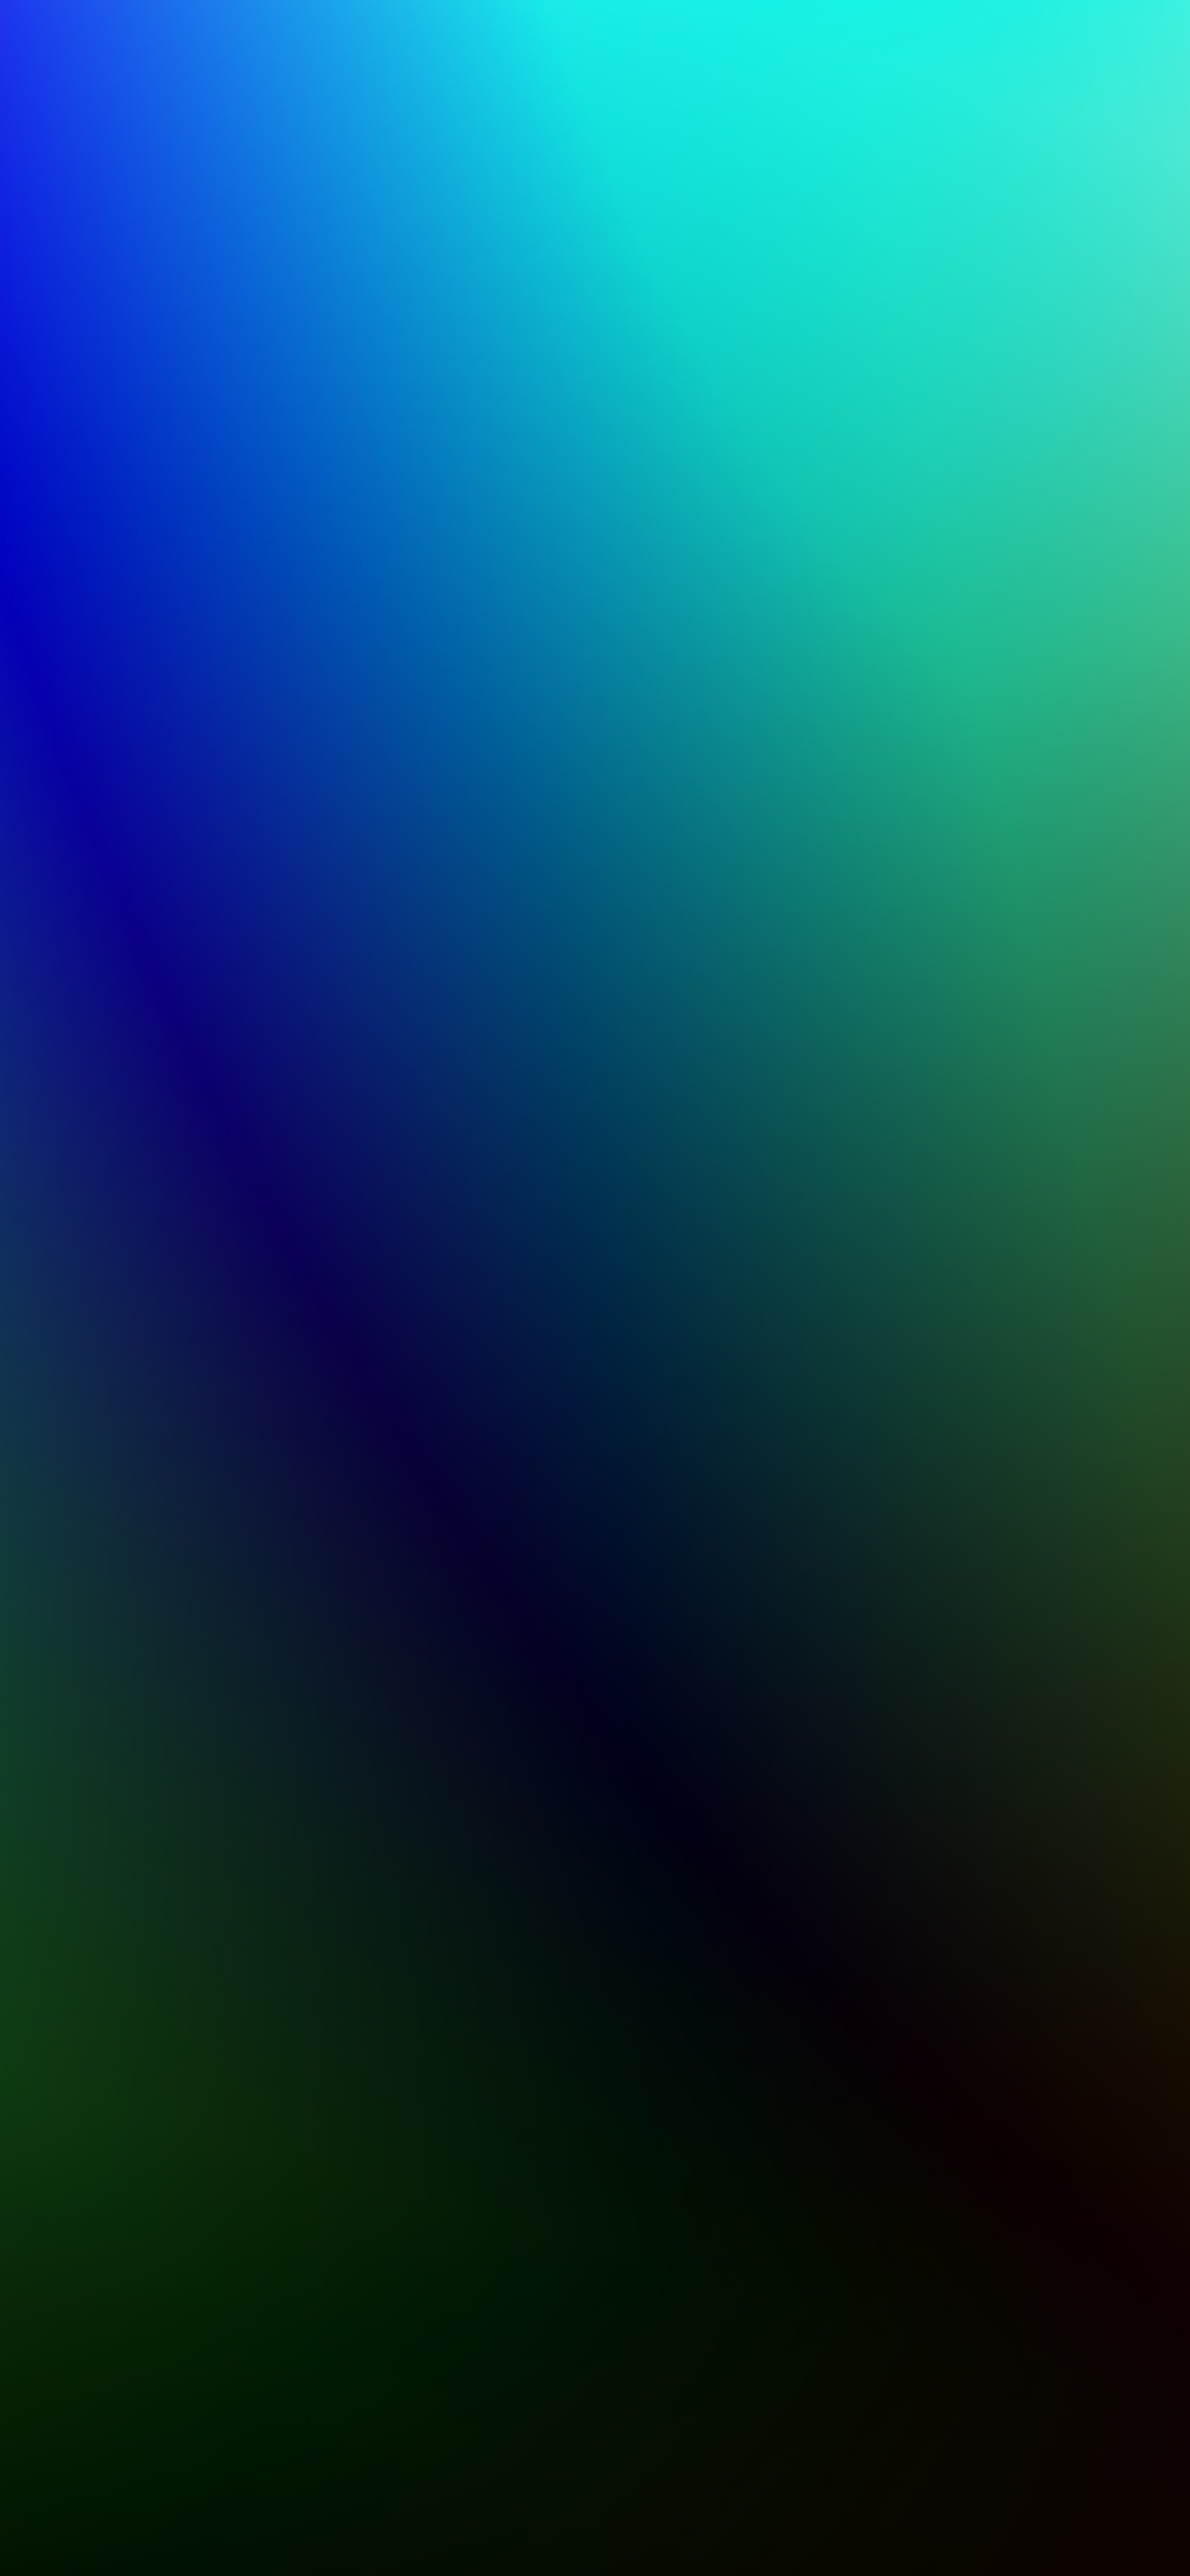 iPhone wallpapers gradient colors green blue Fonds d'écran iPhone du 24/03/2020